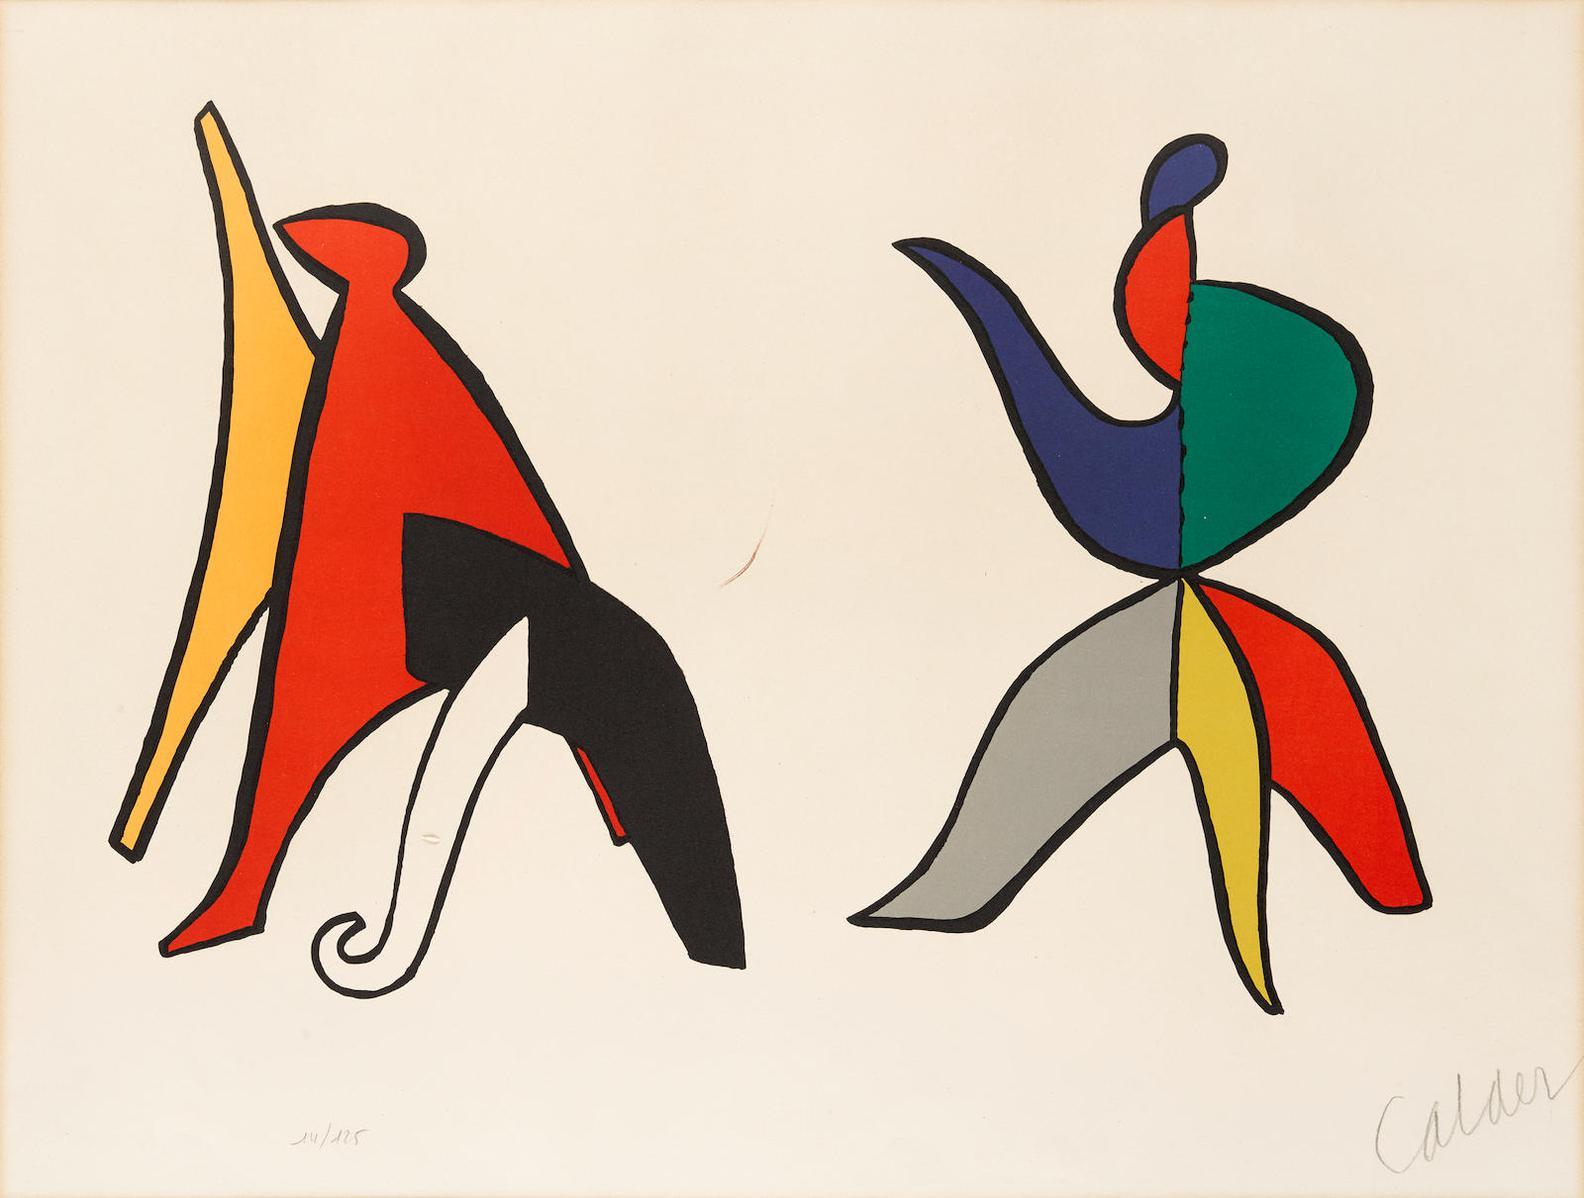 Alexander Calder-2 Plates, From Stabiles 2-1963